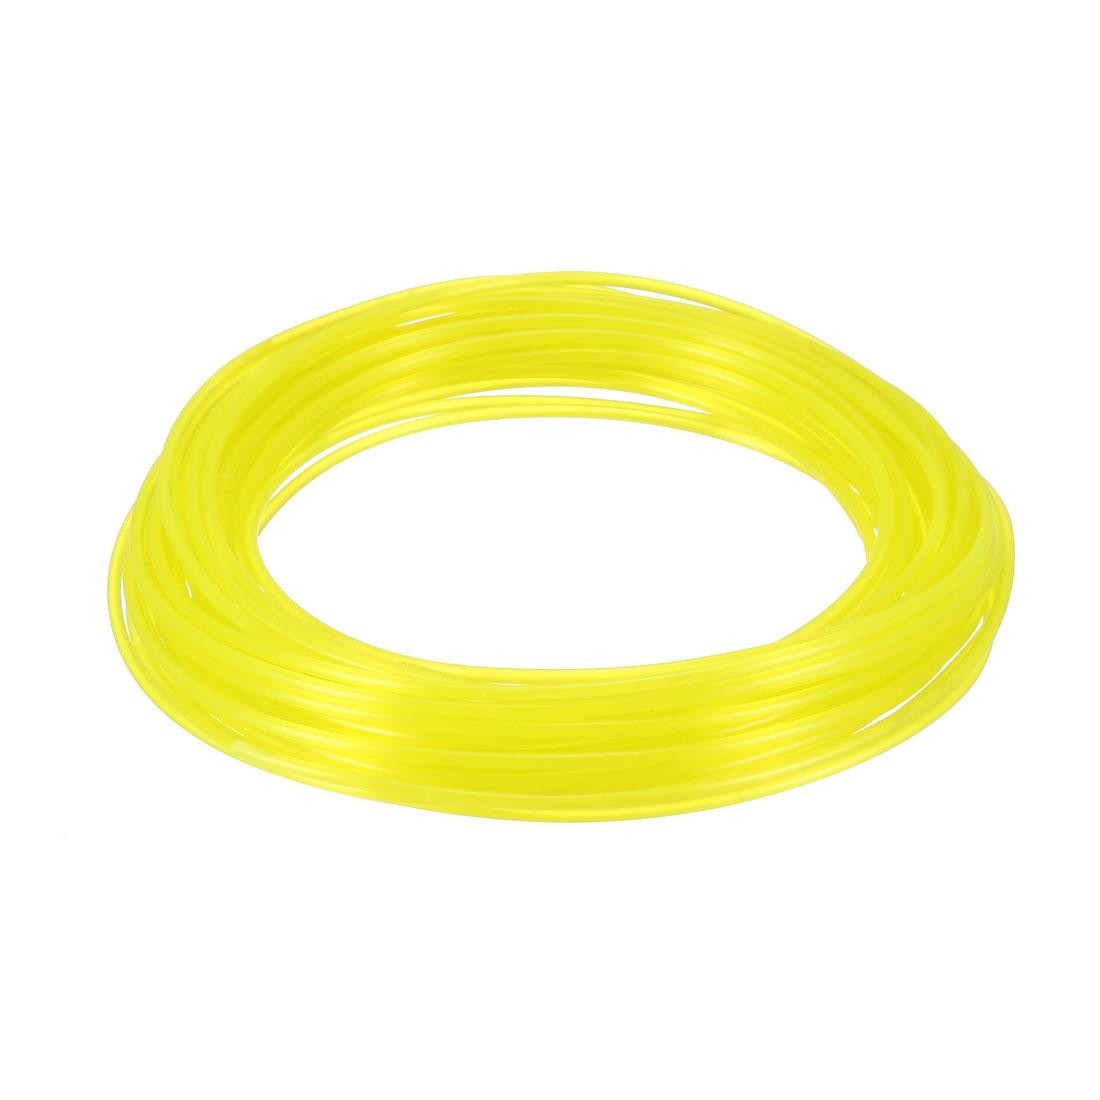 10 Meter/32.5 Ft PLA 3D Pen/3D Printer Filament, 1.75 mm Fluorescent Yellow